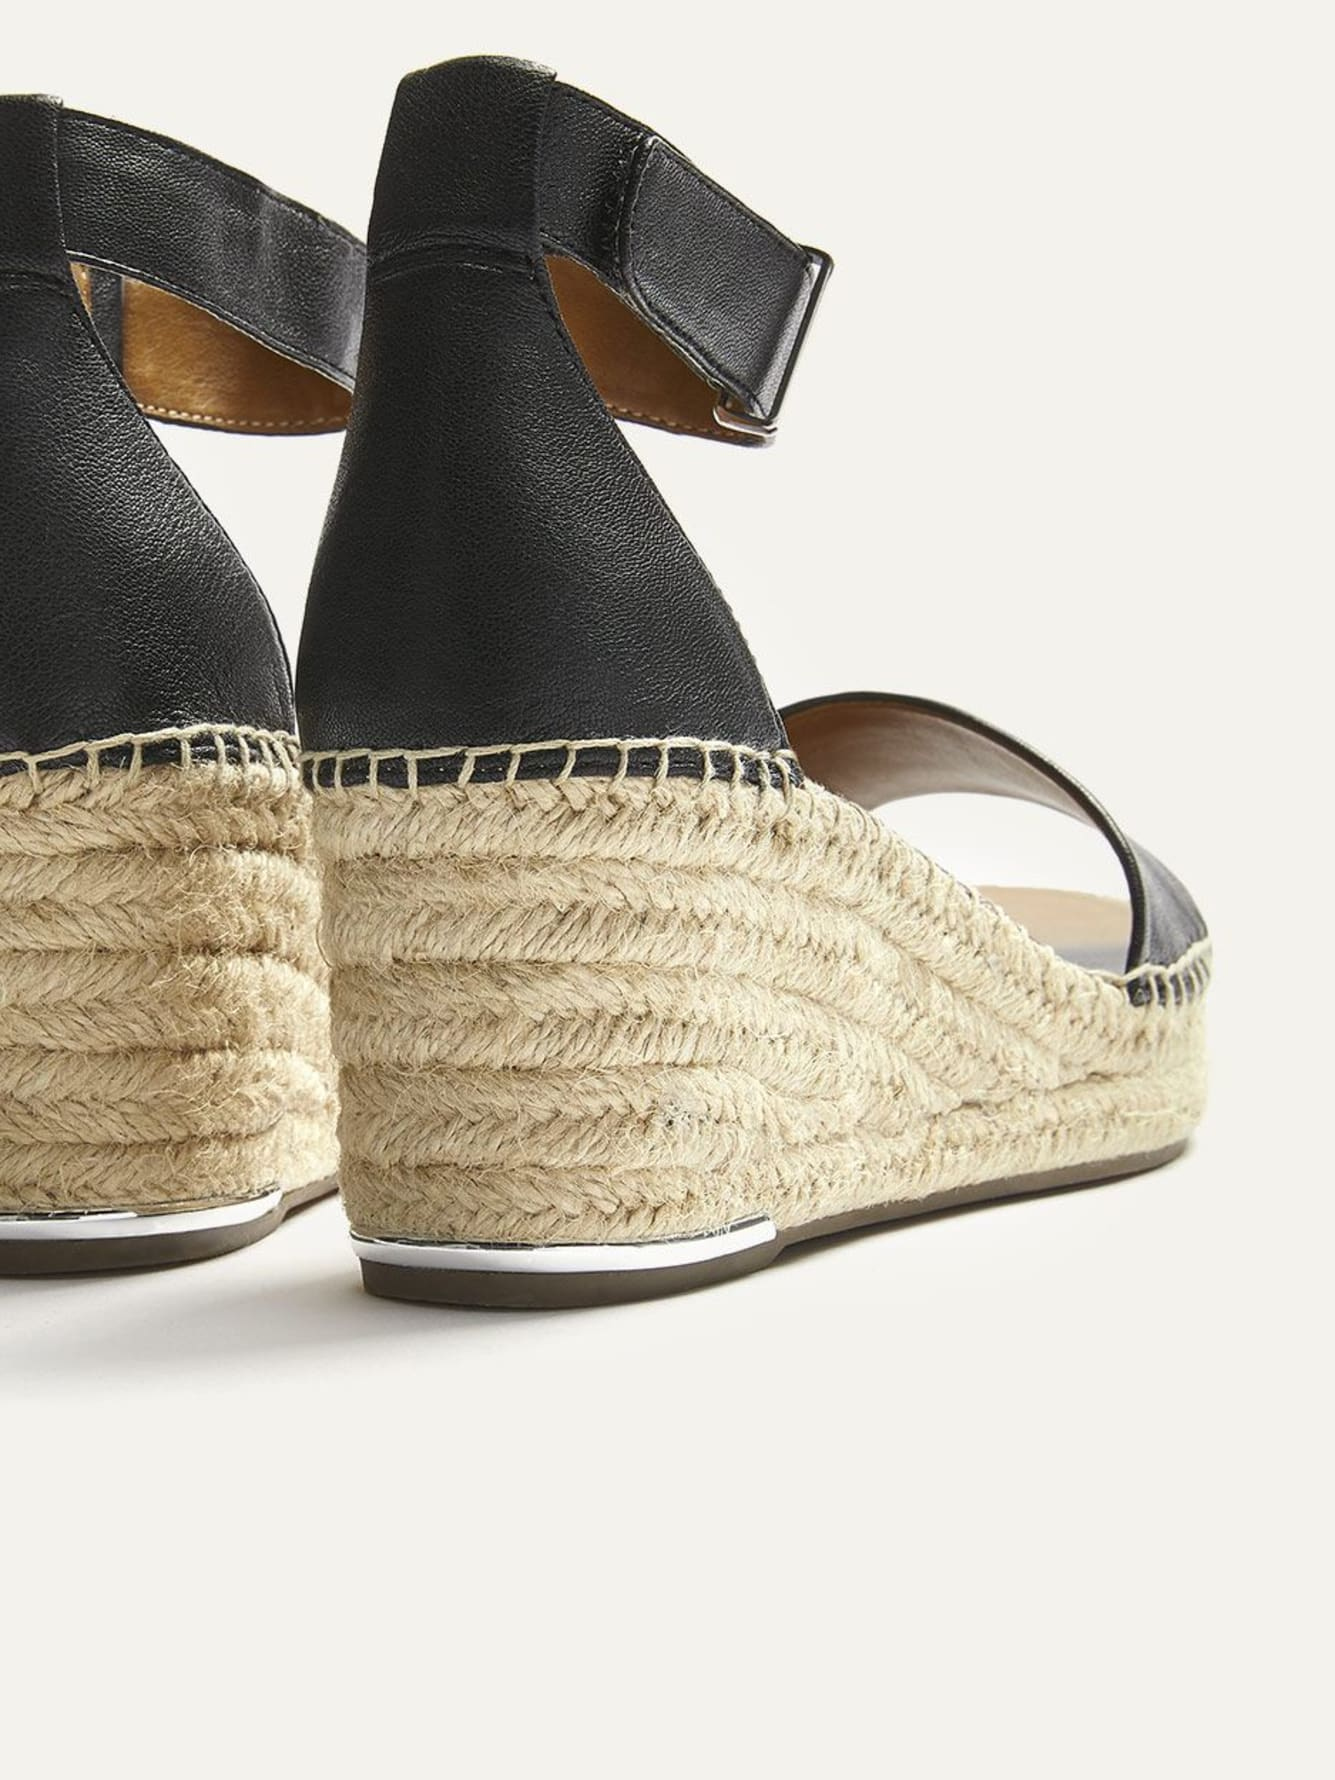 Wide Wedge Leather Espadrilles - Franco Sarto